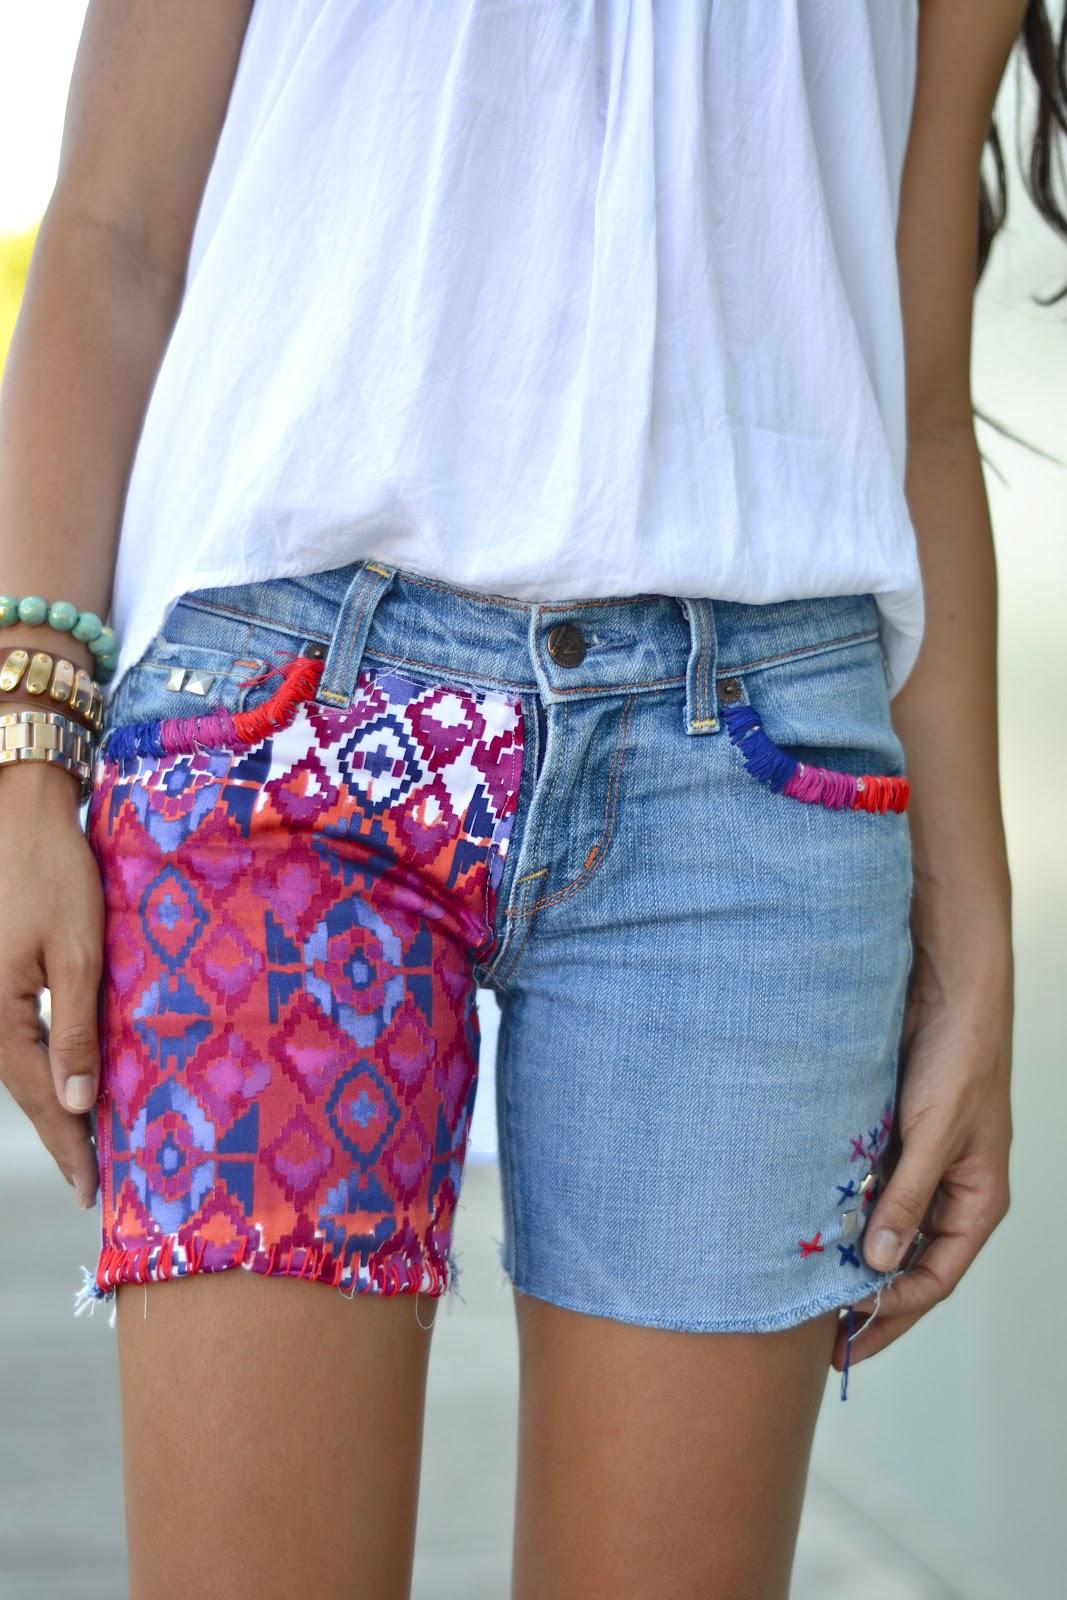 Restyle.Restore.Rejoice: DIY Cutoff Shorts